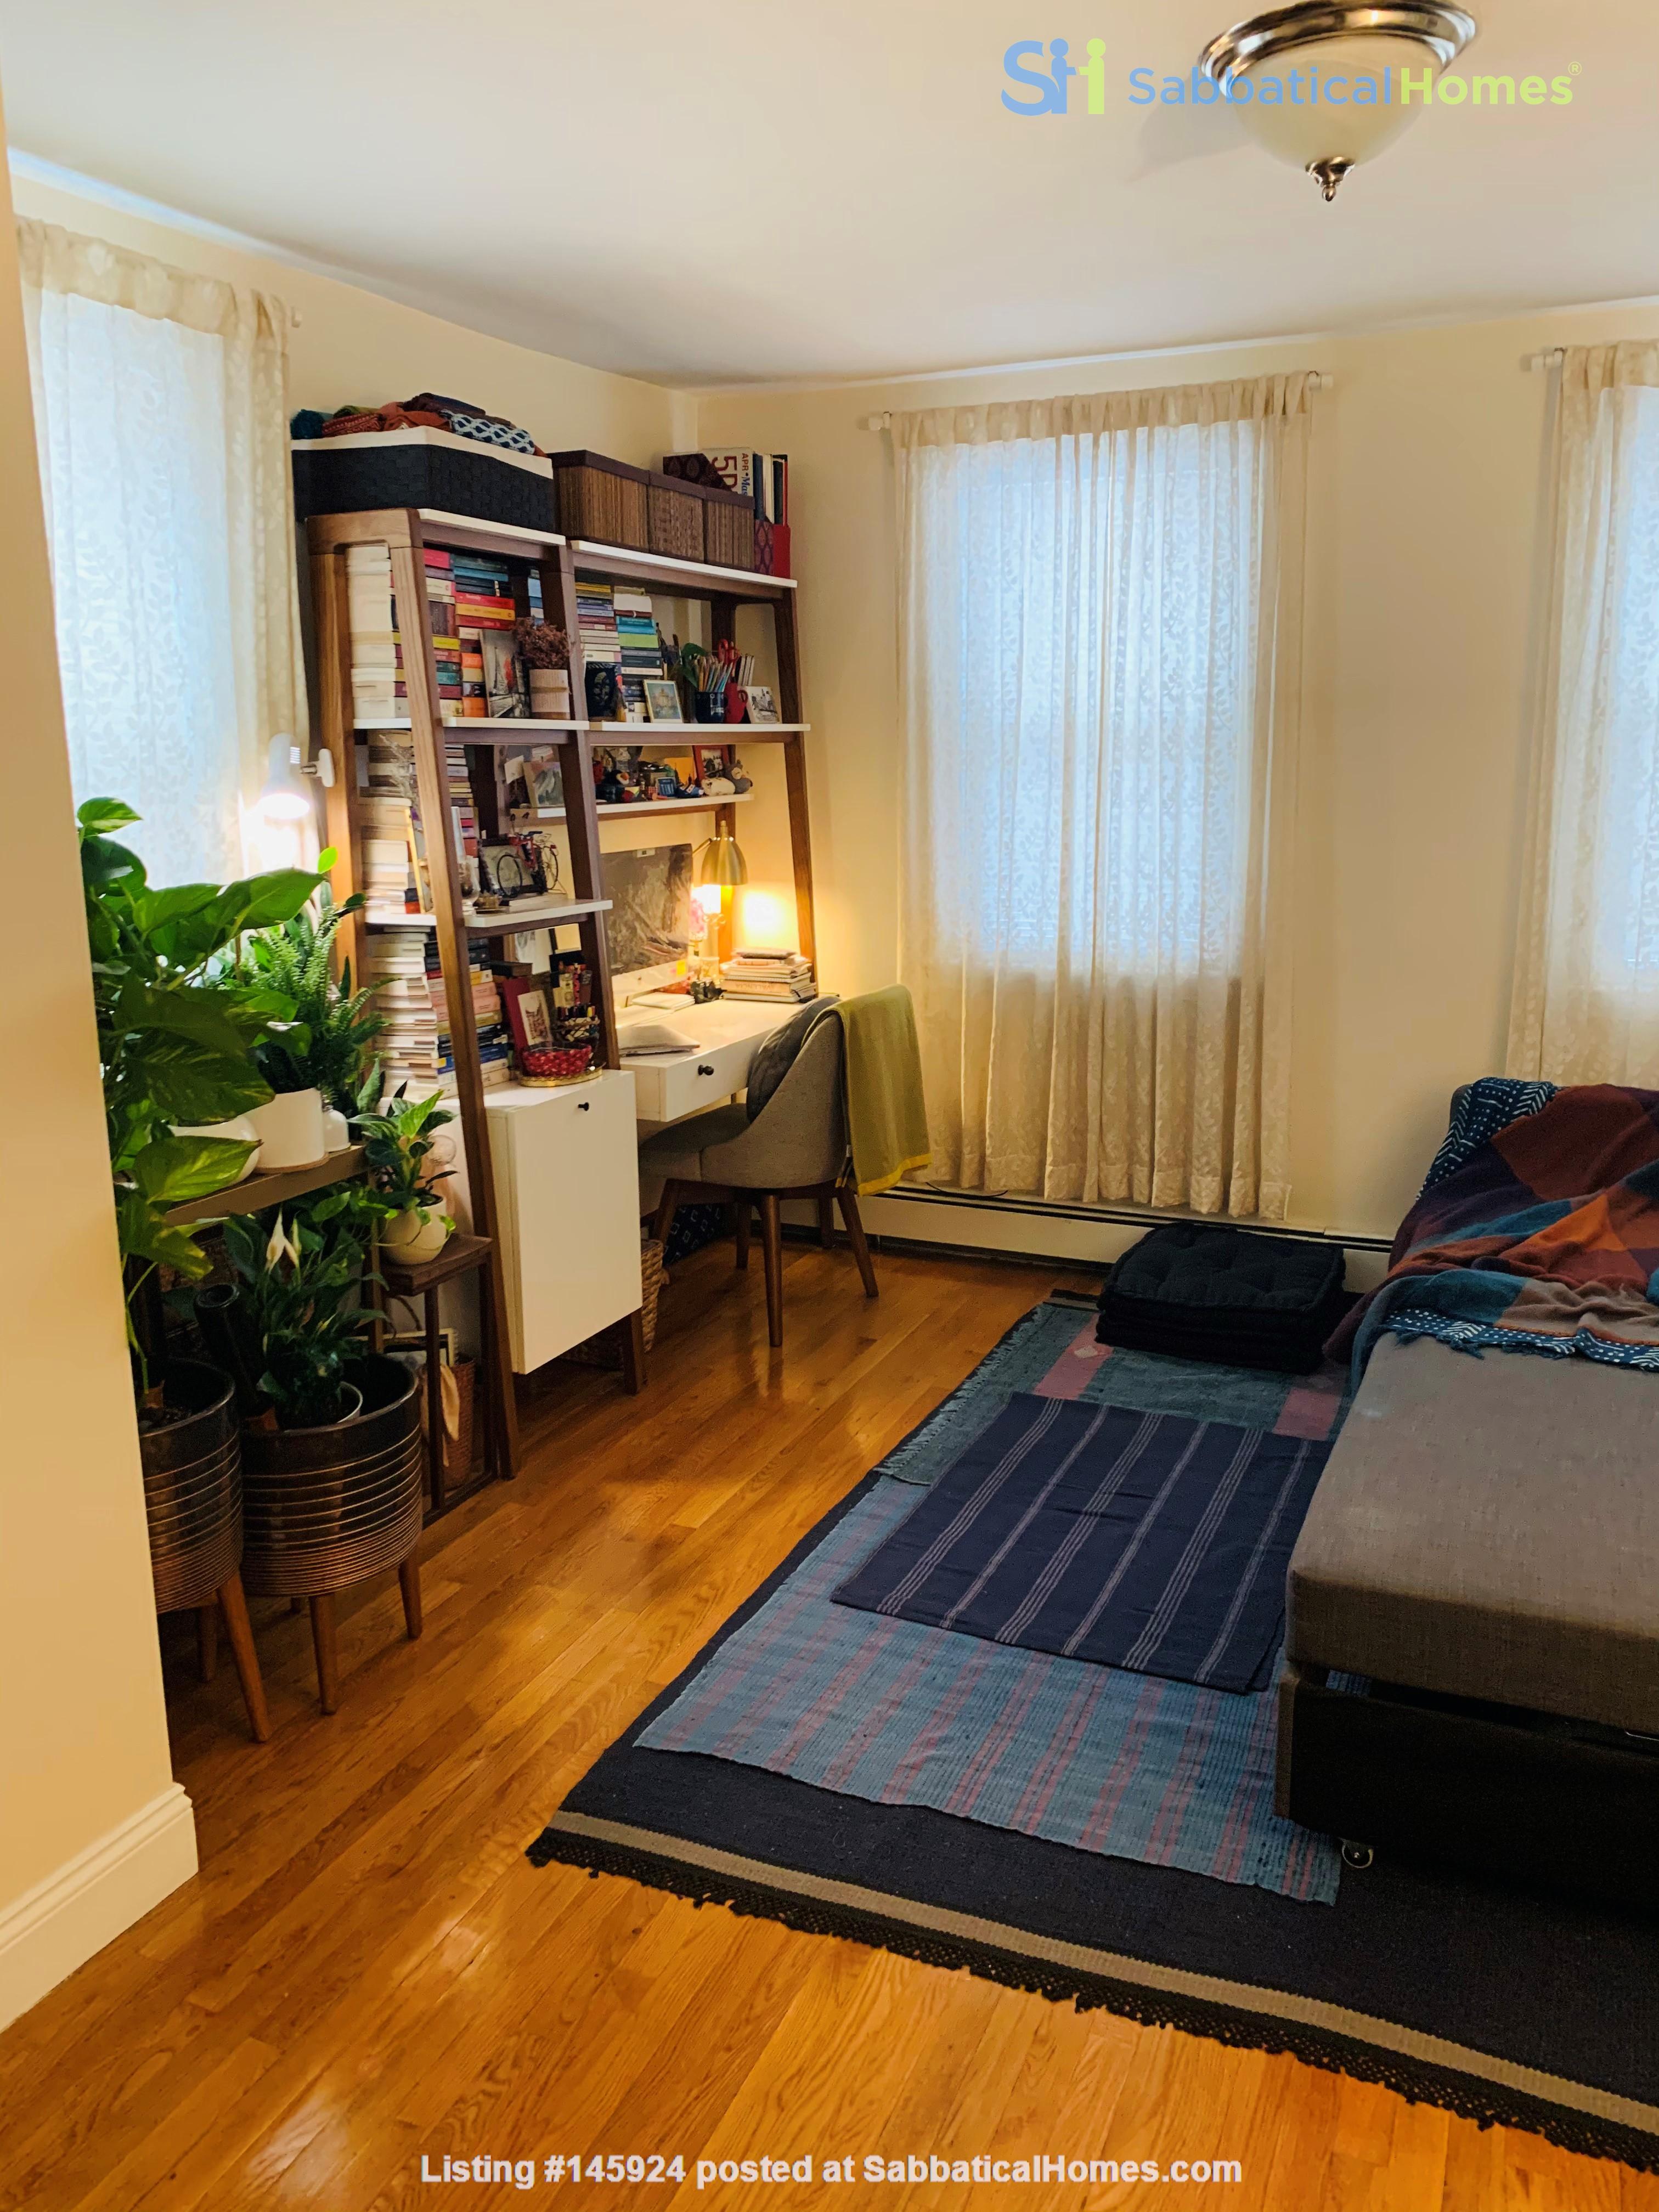 Modern, sunny, 2 bed 1 bath 1st floor unit with W+D, den & backyard garden Home Rental in Cambridge 6